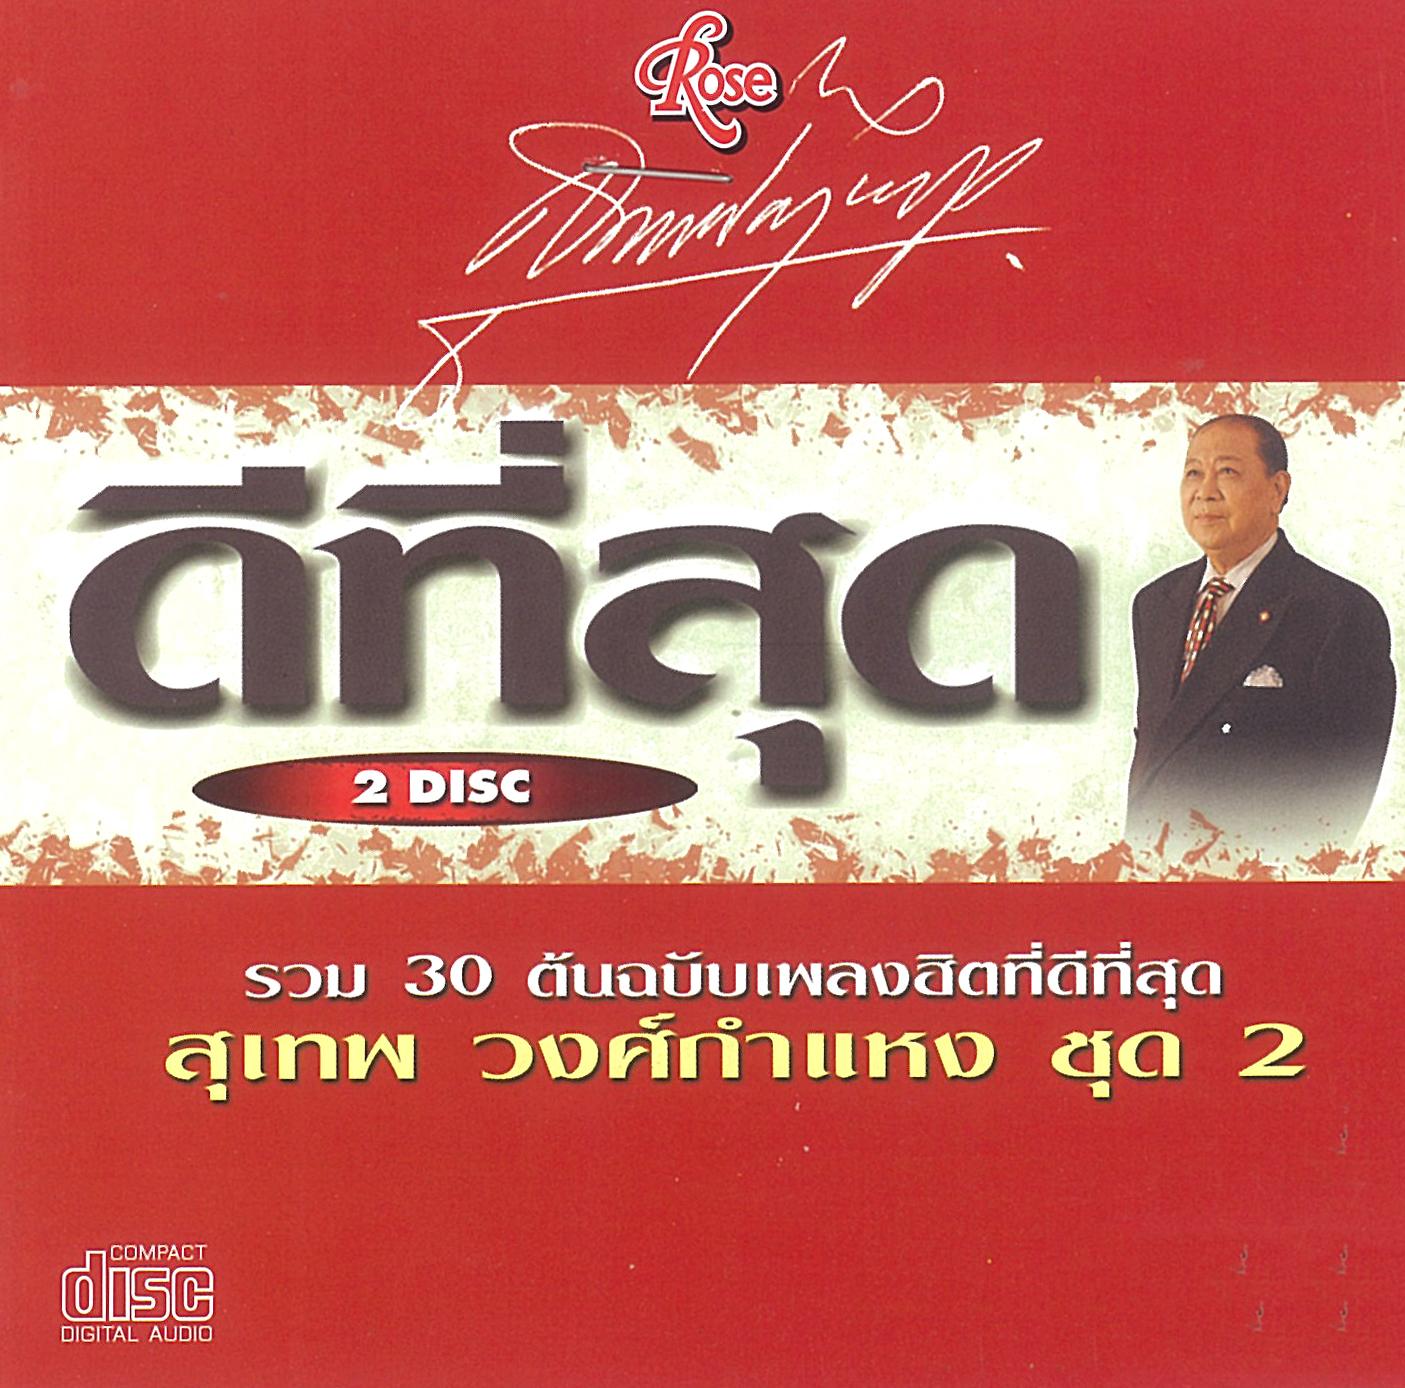 VCDดีที่สุด สุเทพ วงศ์กำแหง ชุด 2